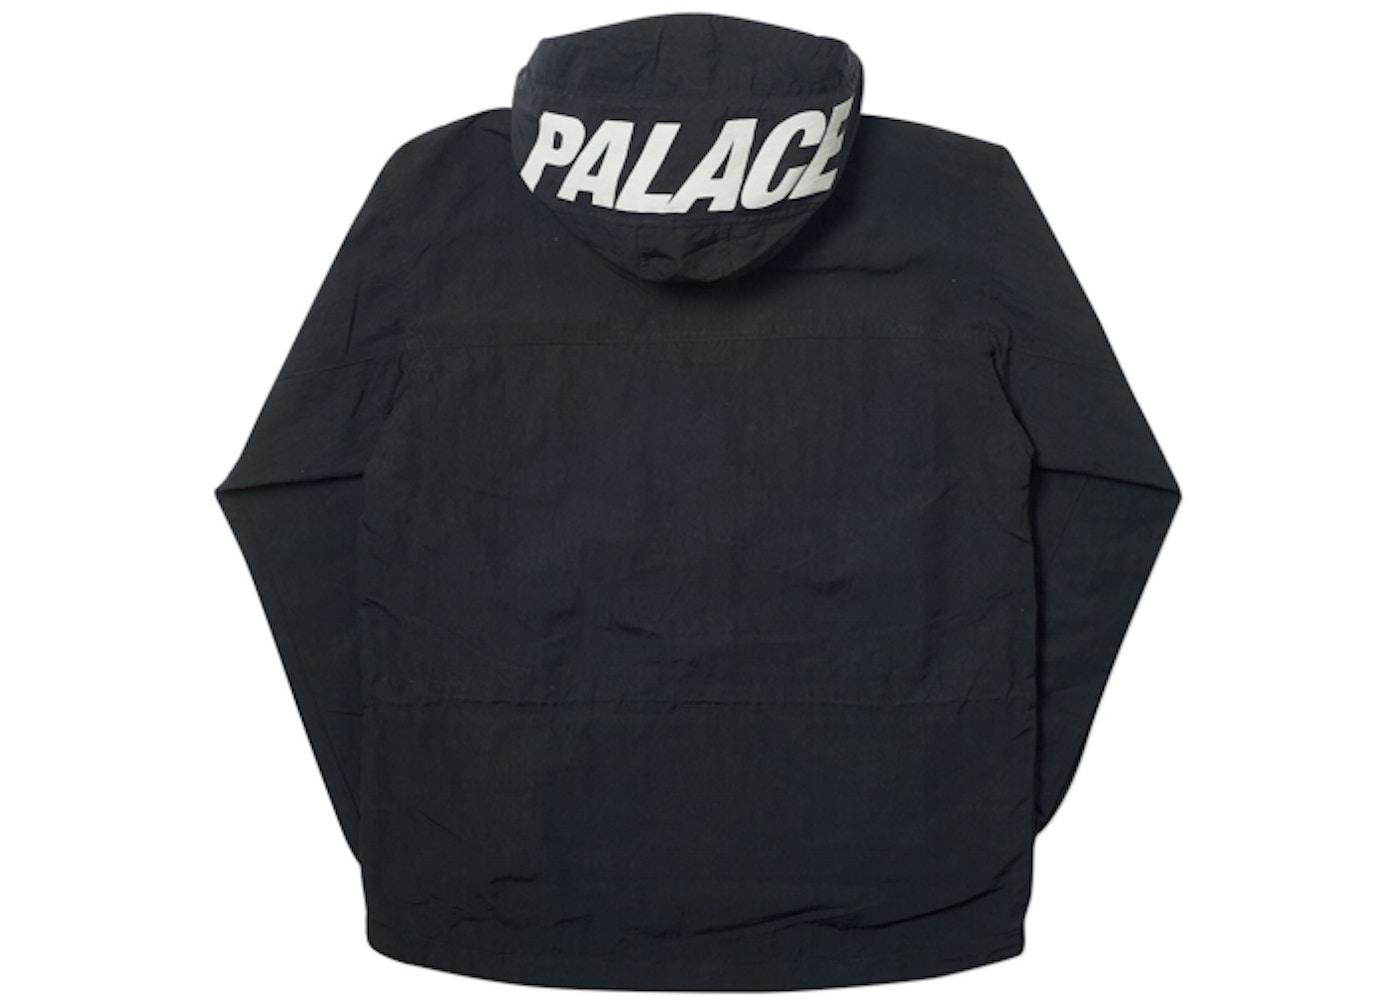 e845901d2921 Palace Bello Jacket Black - FW18